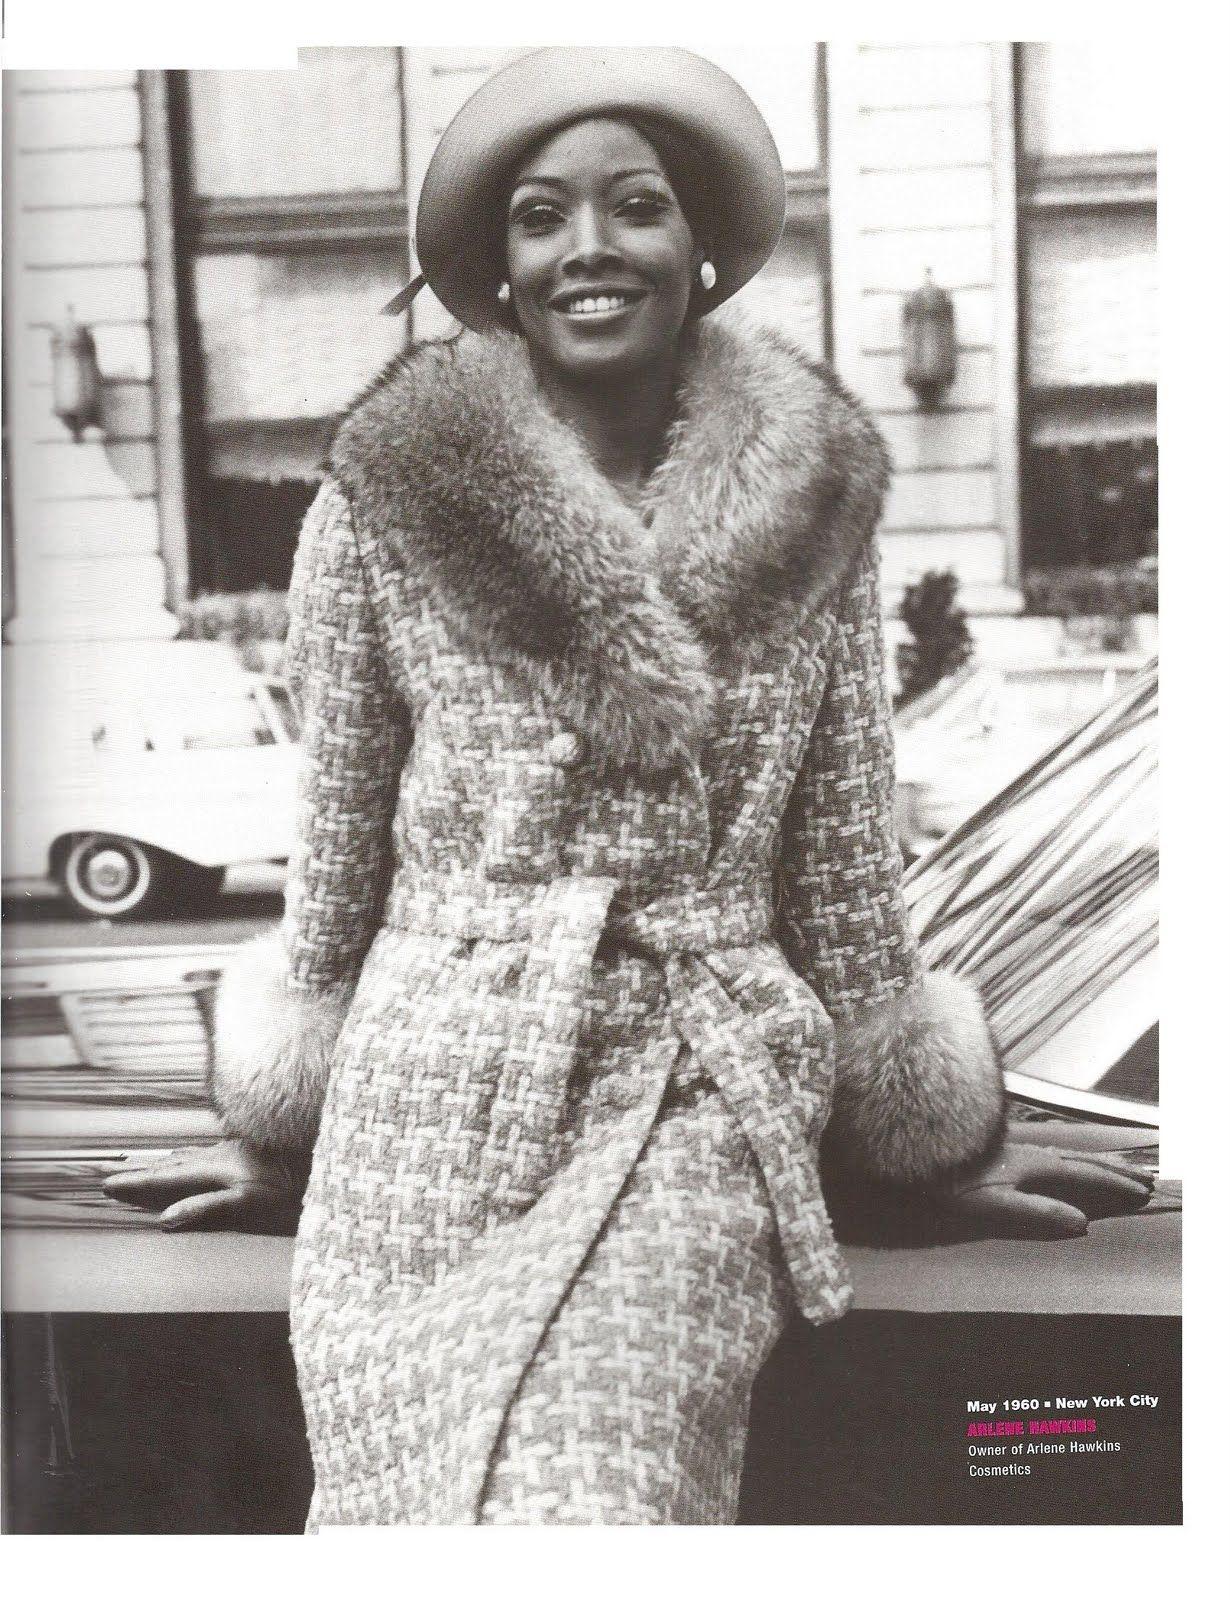 Arlene Hawkins May 1960 New York City More